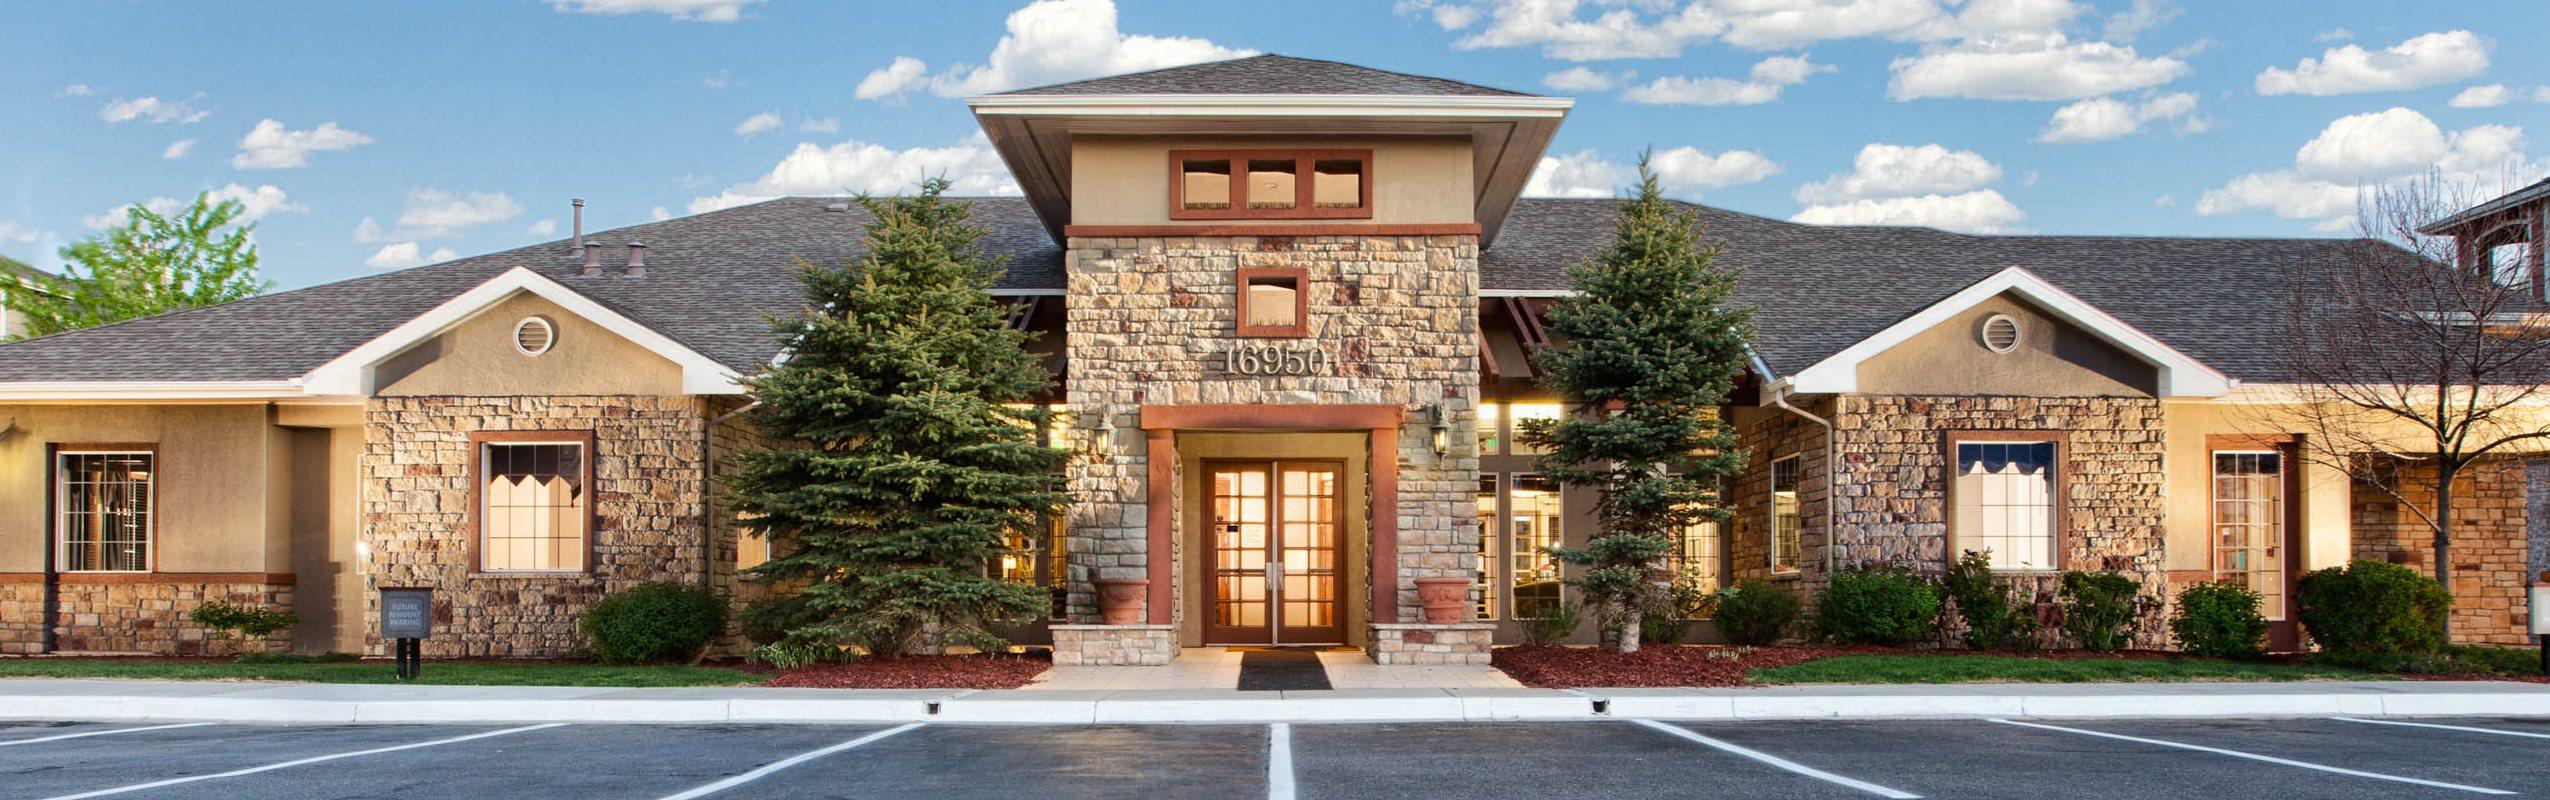 1,2 & 3 Bedroom Apartments in Parker, CO | Ranchstone | Floor Plans